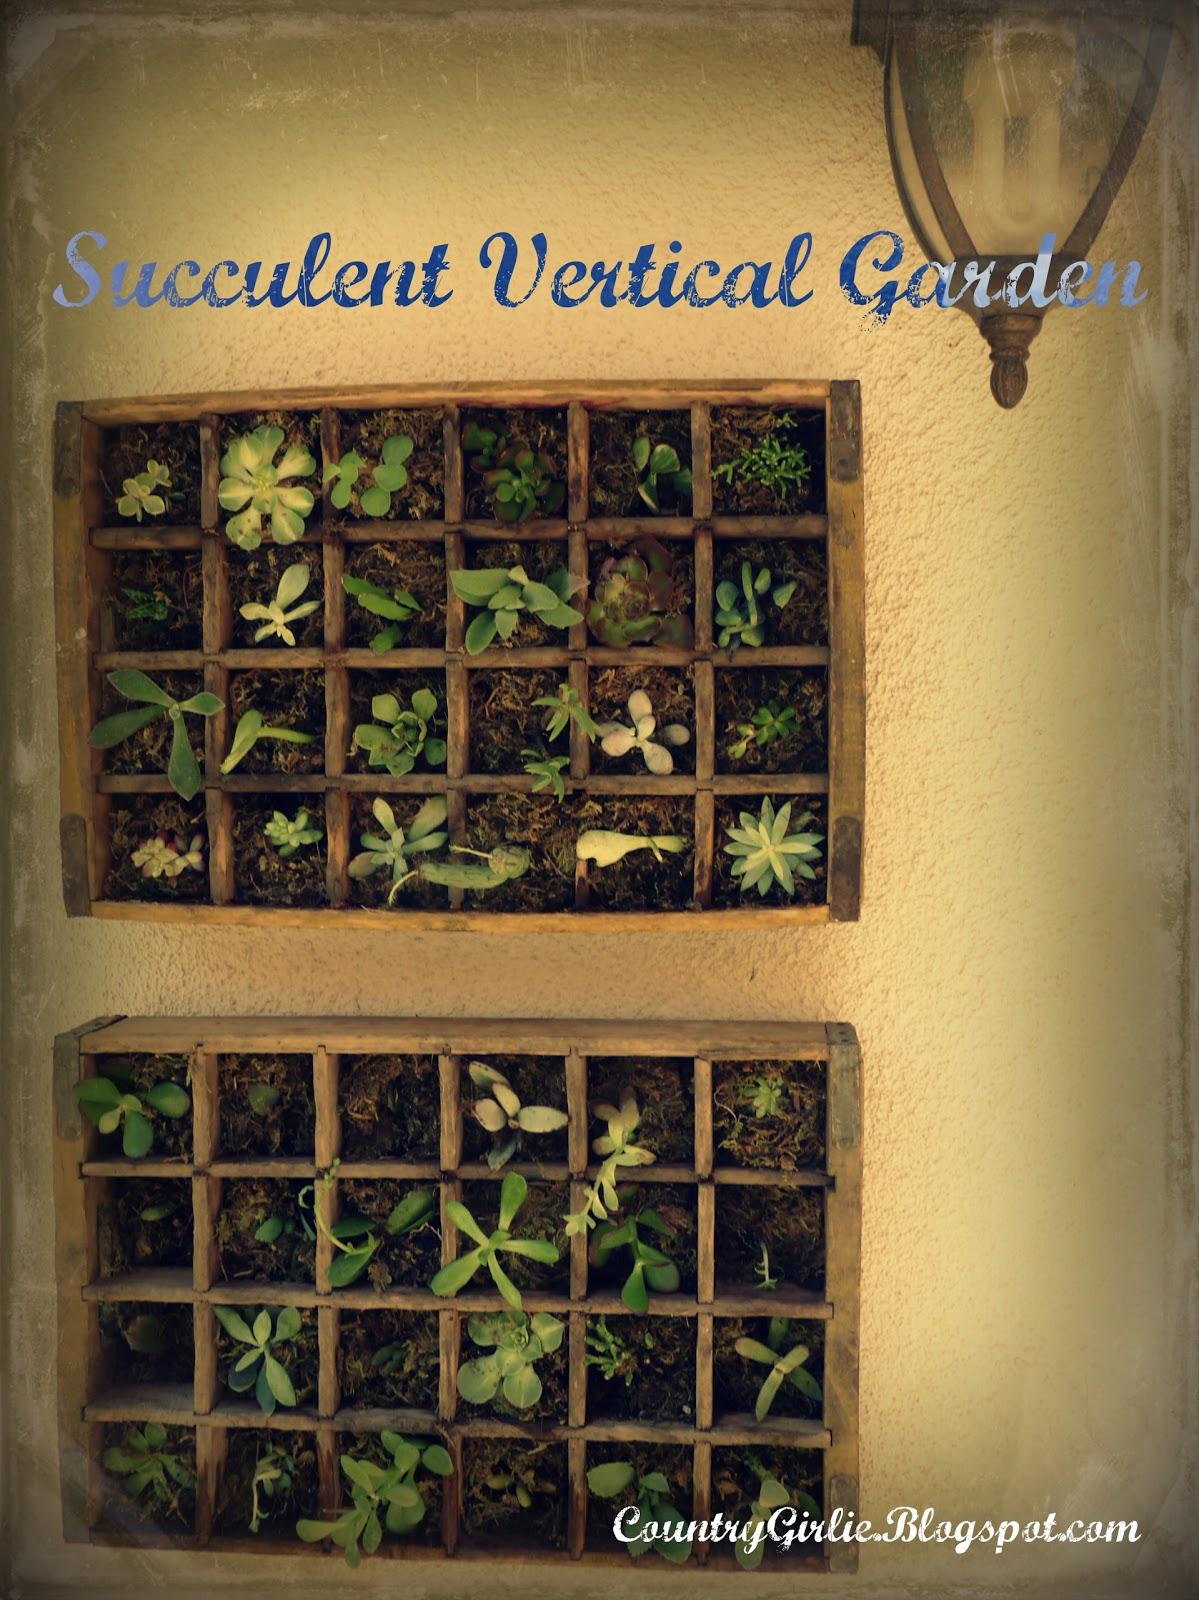 Country Girlie: Succulent Wall - Vertical Gardening - TUTORIAL